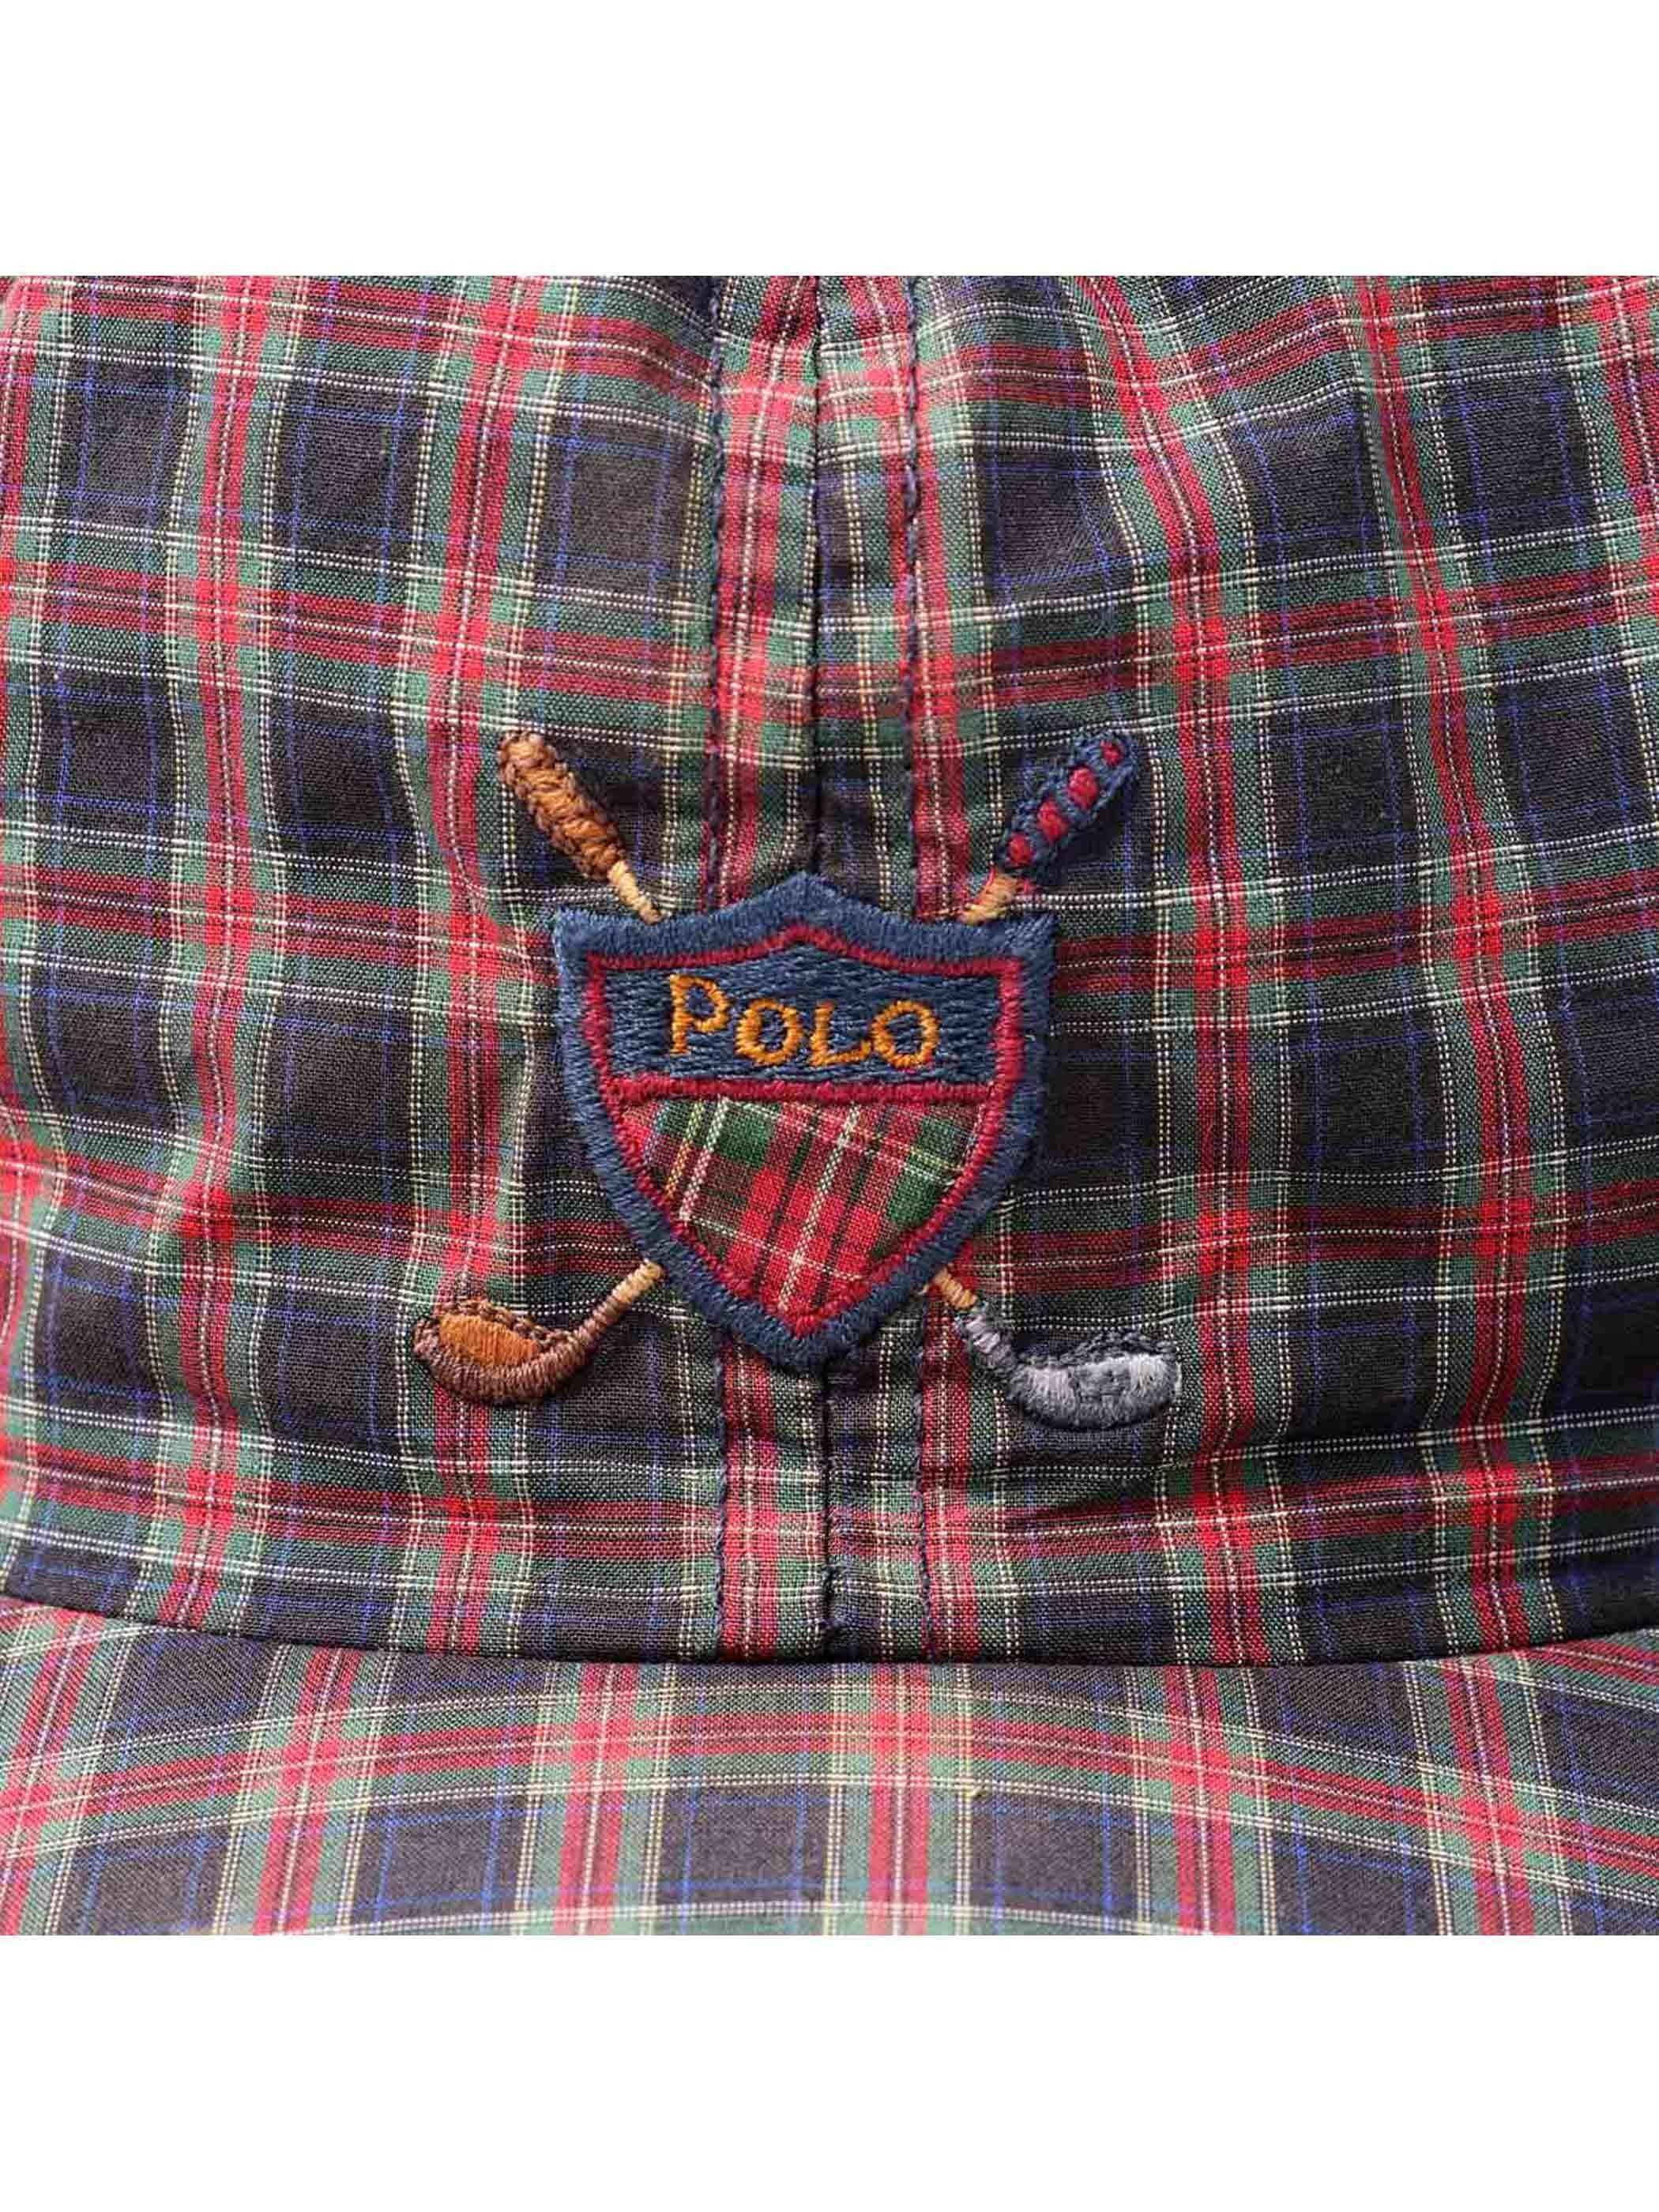 90's POLO RALPH LAUREN USA製 タータンチェック ストラップバックキャップ [FREE]